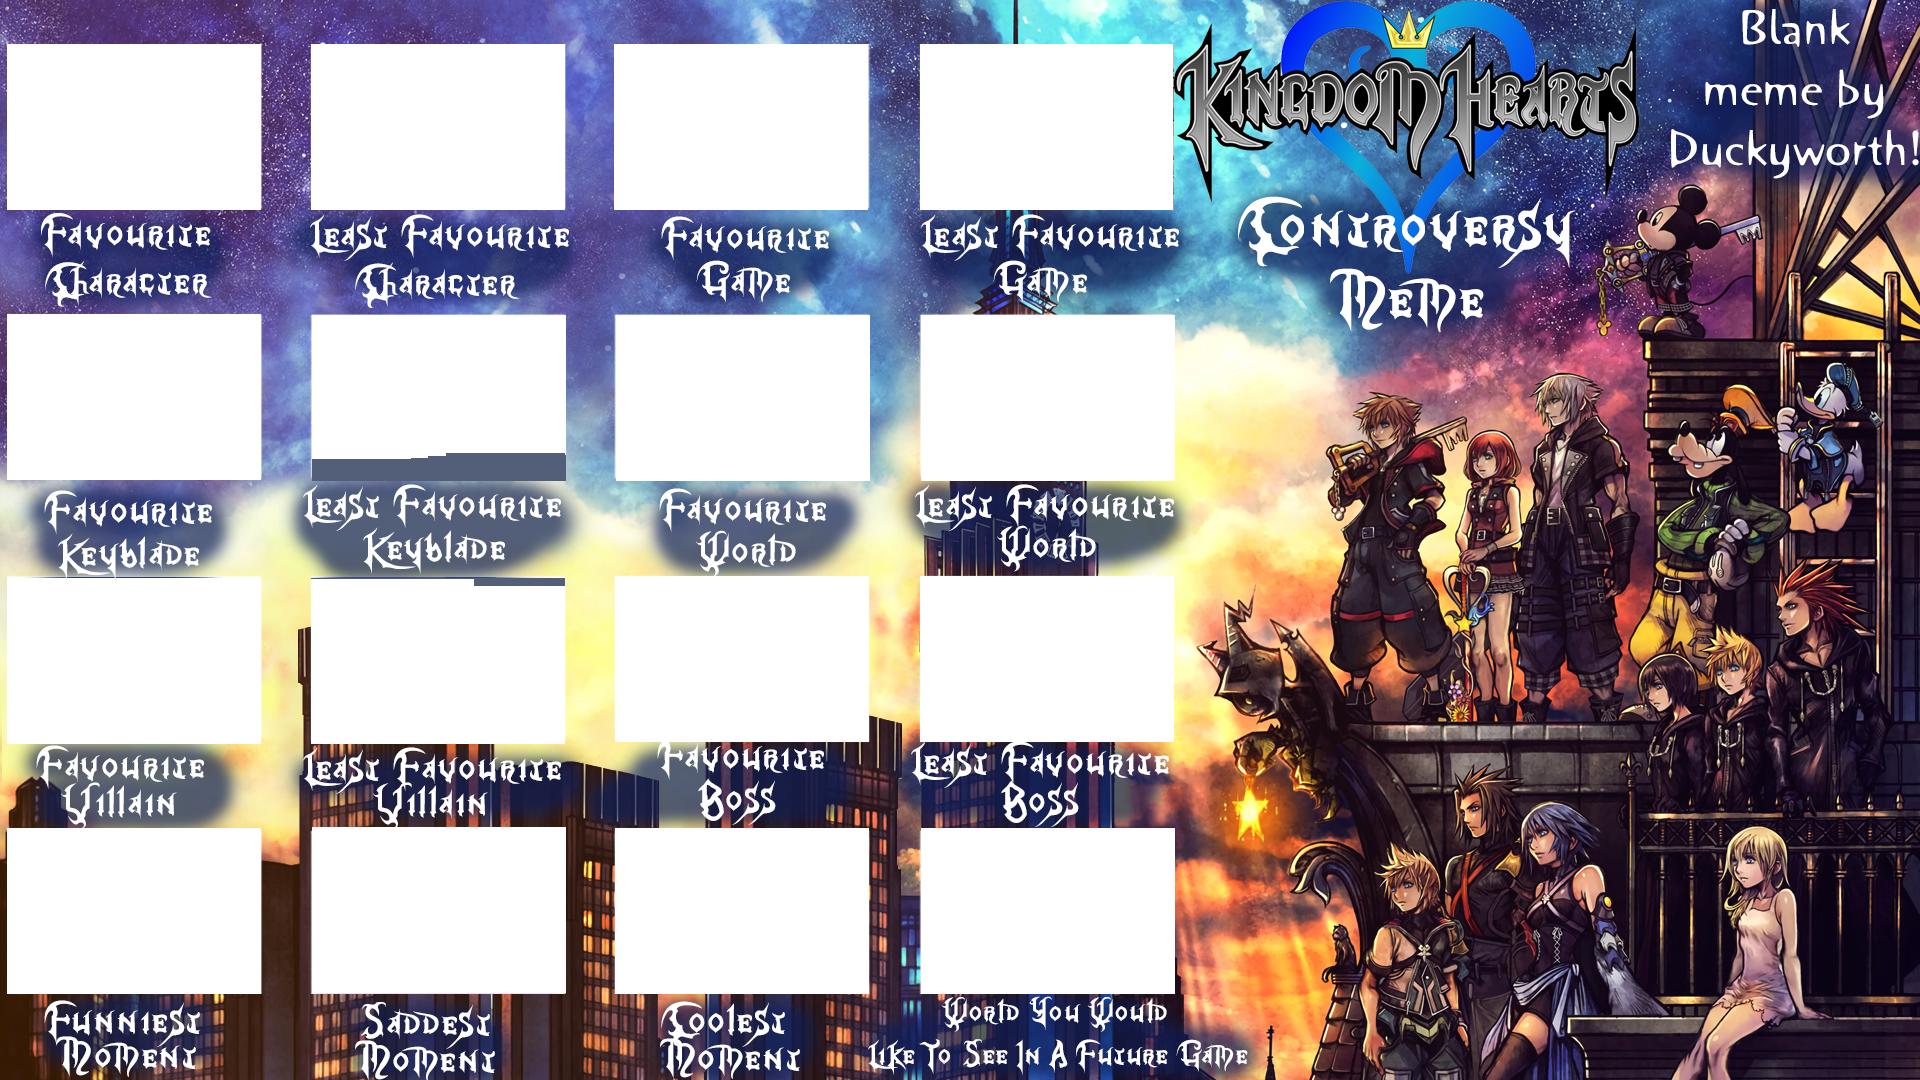 Kingdom Hearts Controversy Meme Blank By Duckyworth On Deviantart